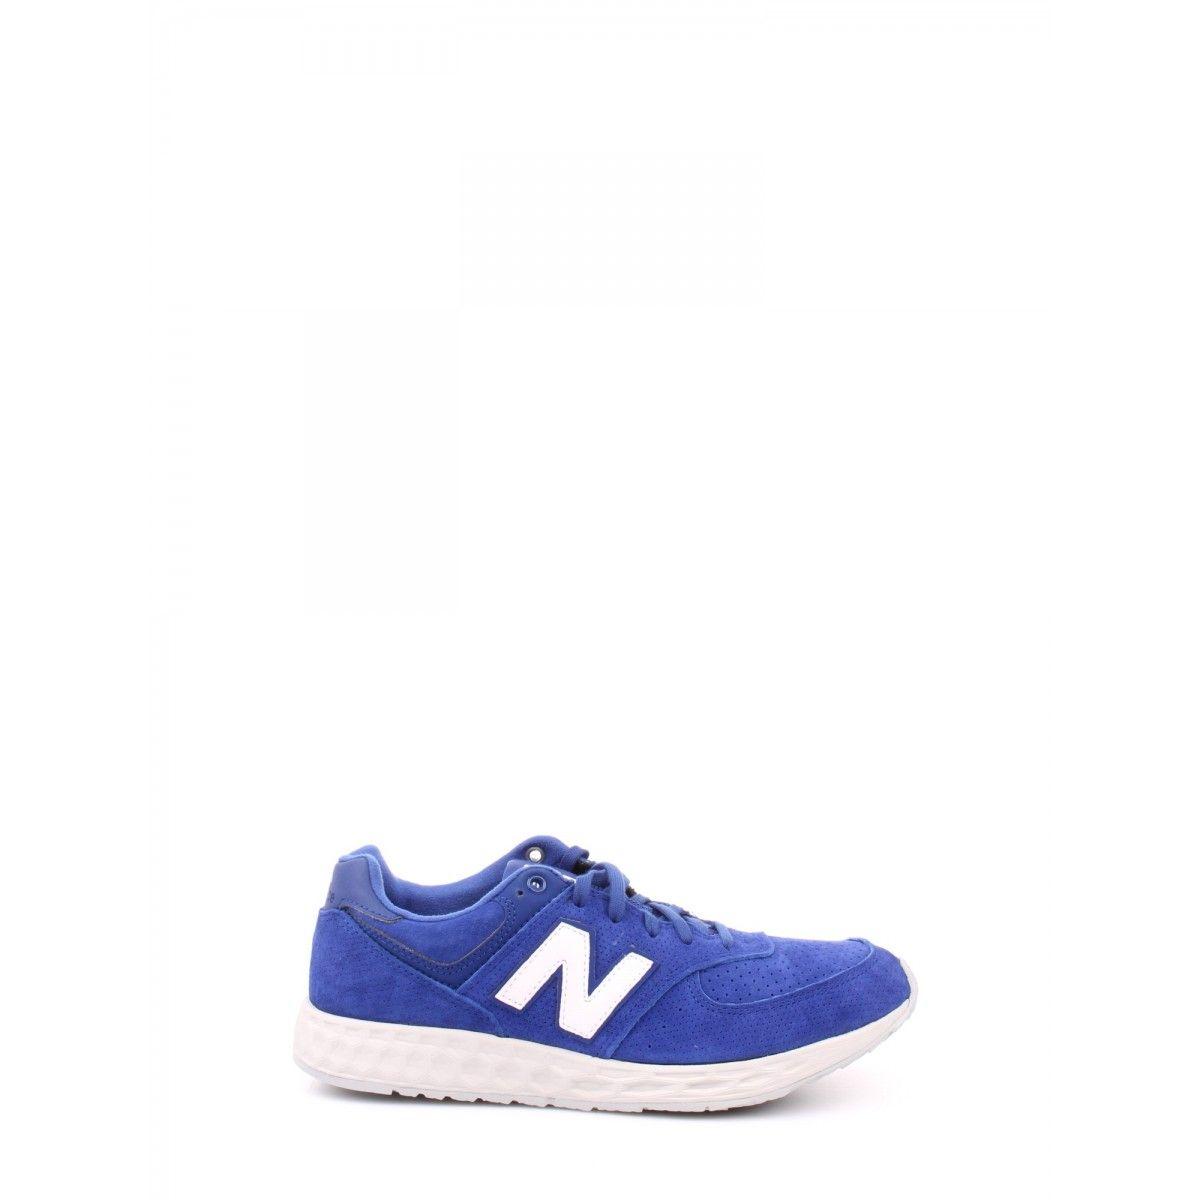 New balance - Leather/synthetic/mesh blue MFL574FE